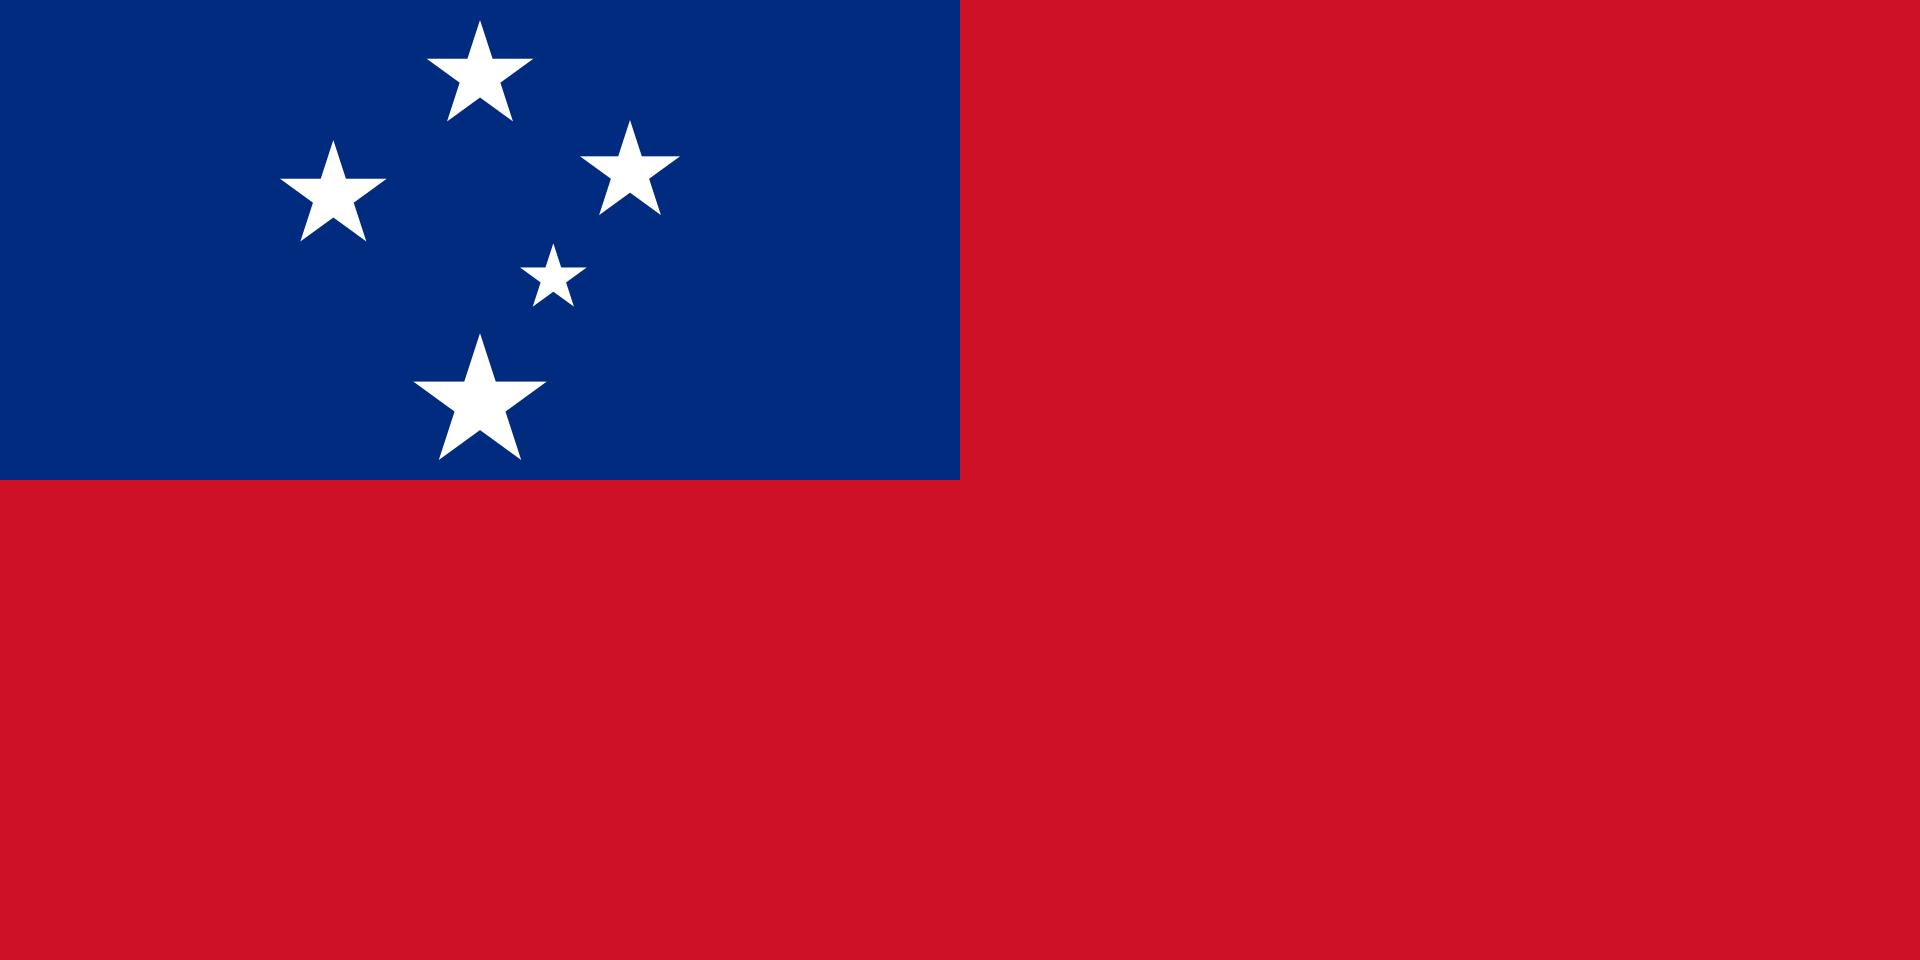 The flag of Samoa.